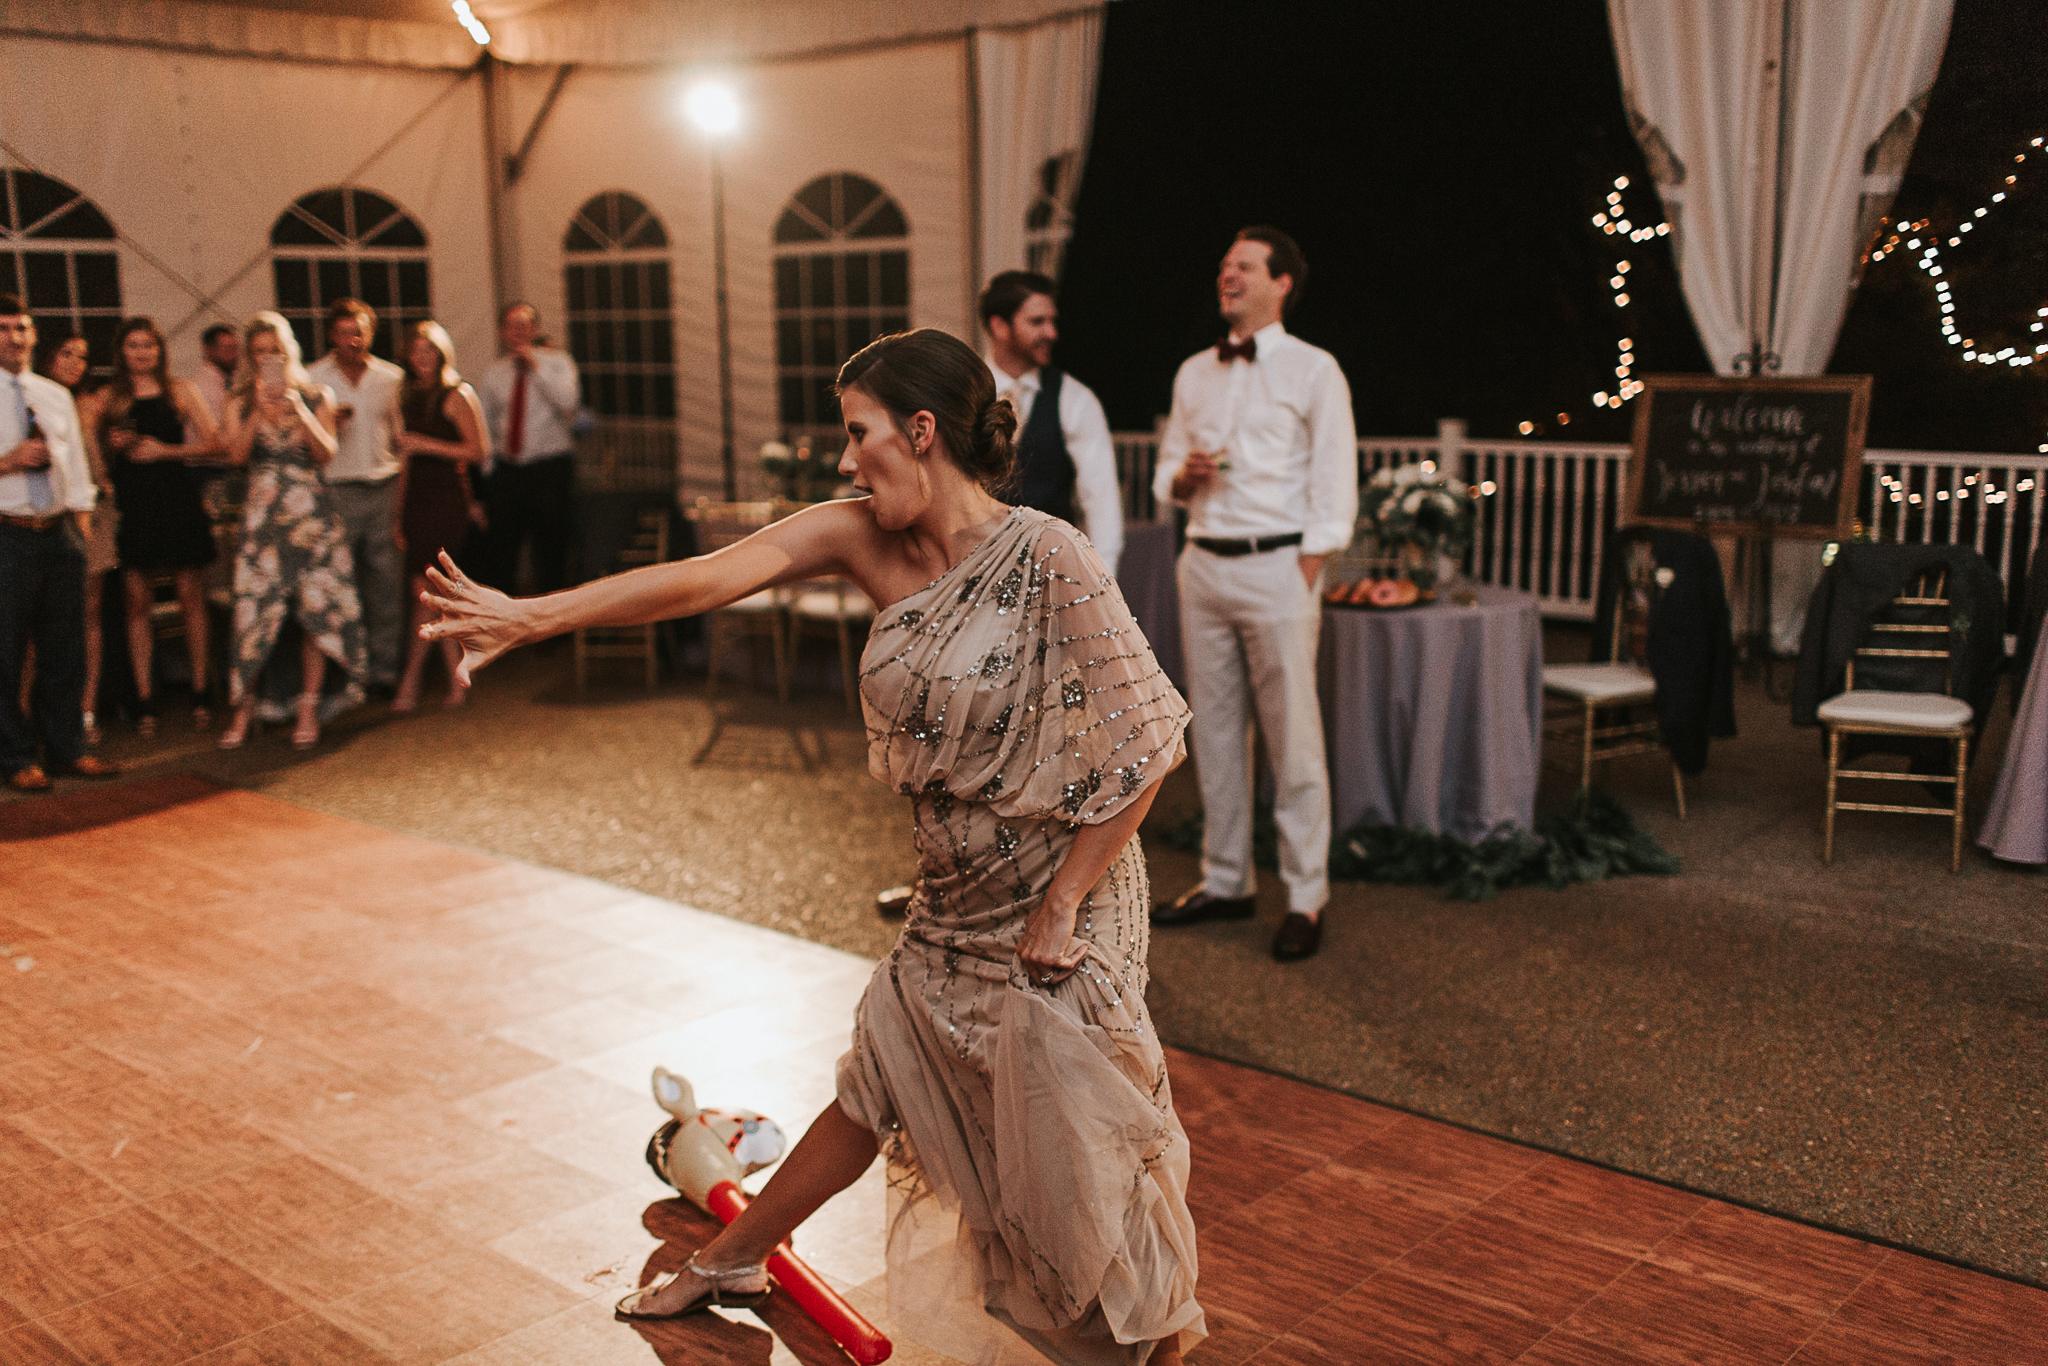 riverwood-mansion-wedding-photos-nashville-tn-19.jpg